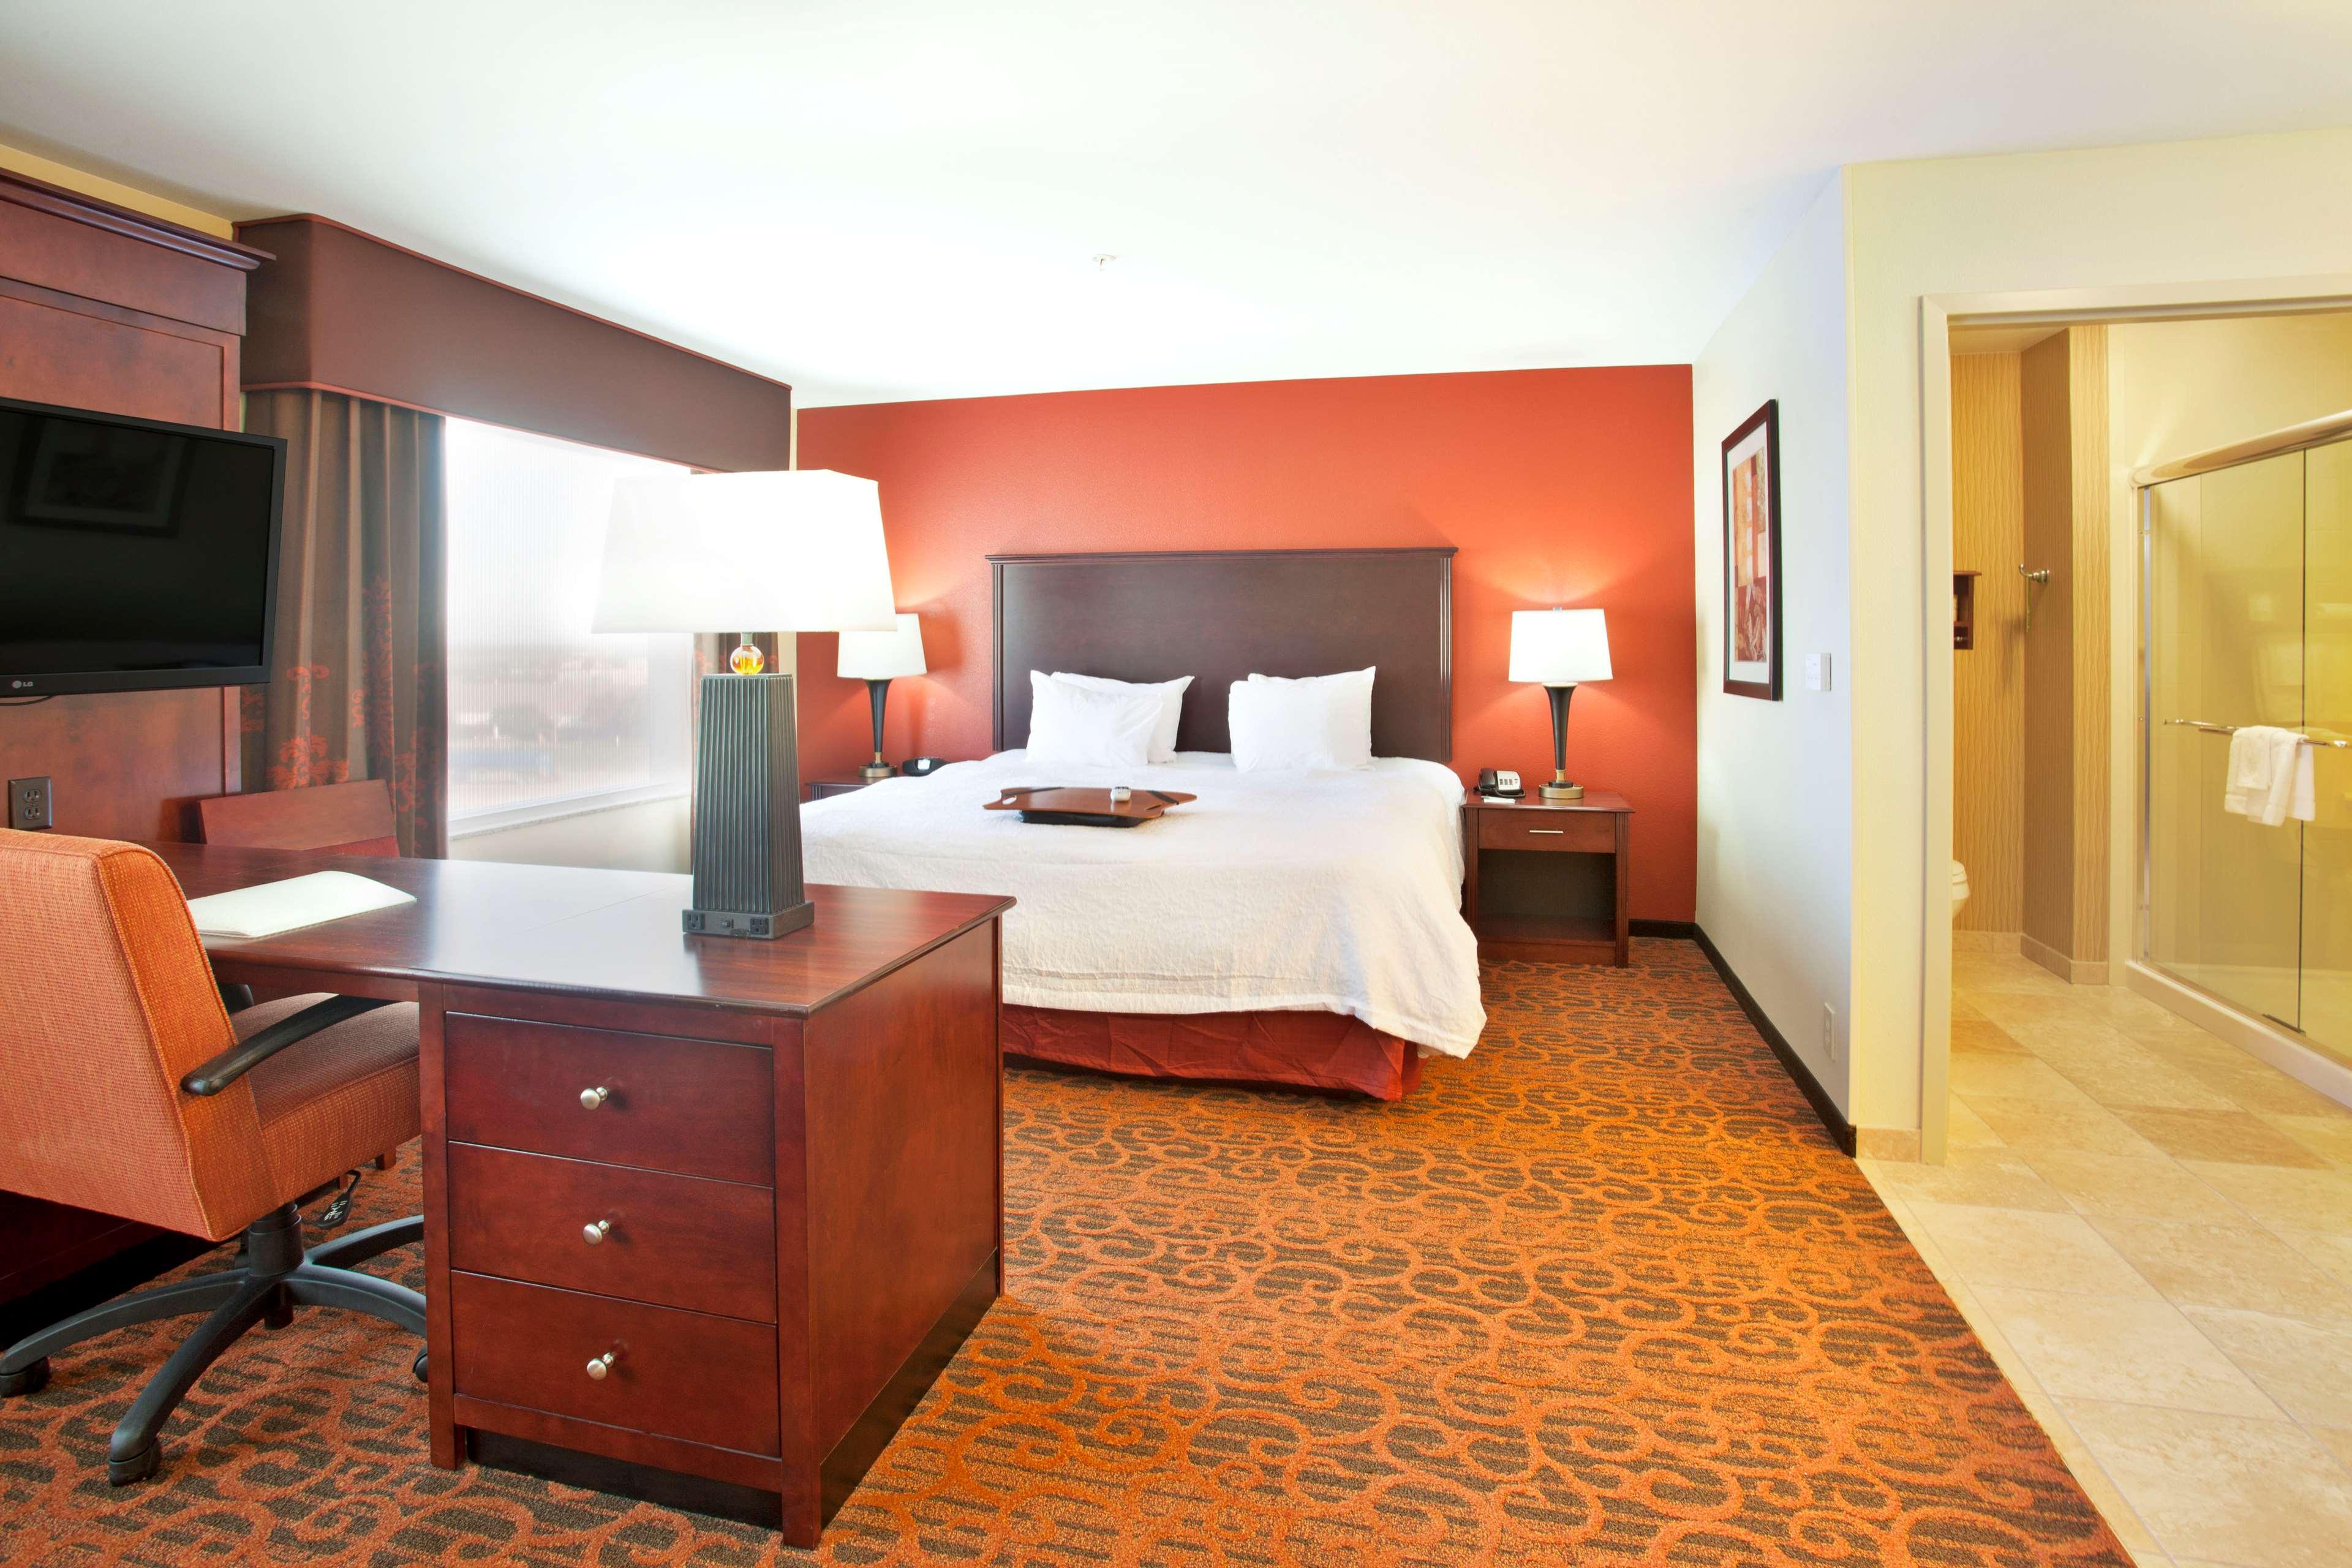 Hampton Inn & Suites Fort Worth-West-I-30 image 17